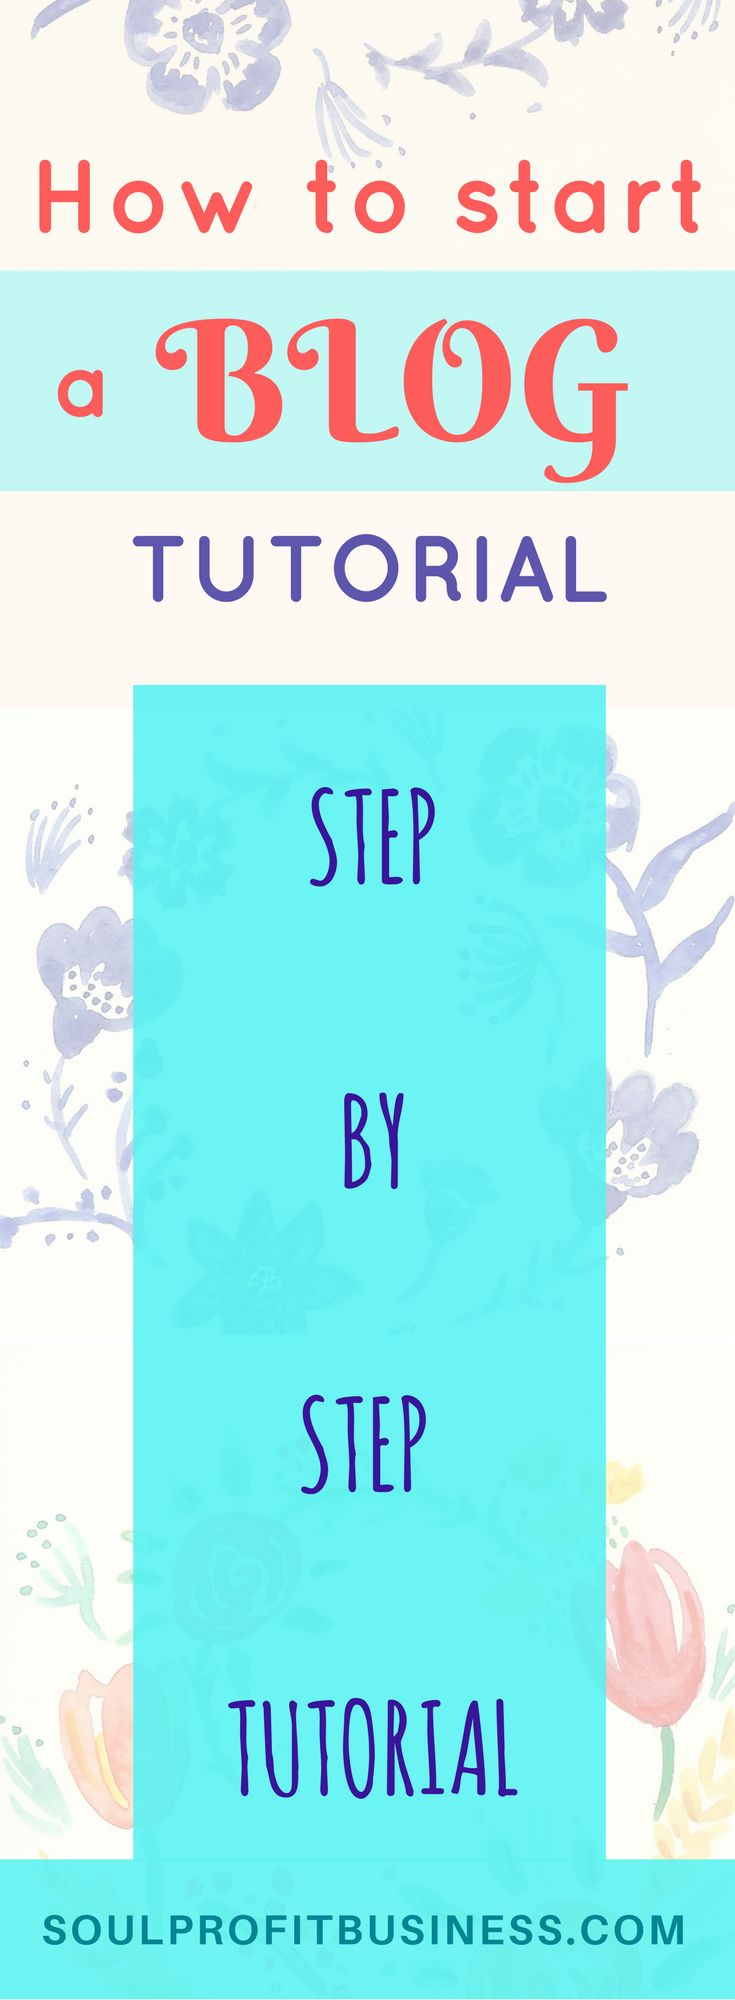 How to start a blog tutorial. Learn how to set up a blog. Easy step by step system with screen shots. #startablog #setupablog #howtostartablog #createablog